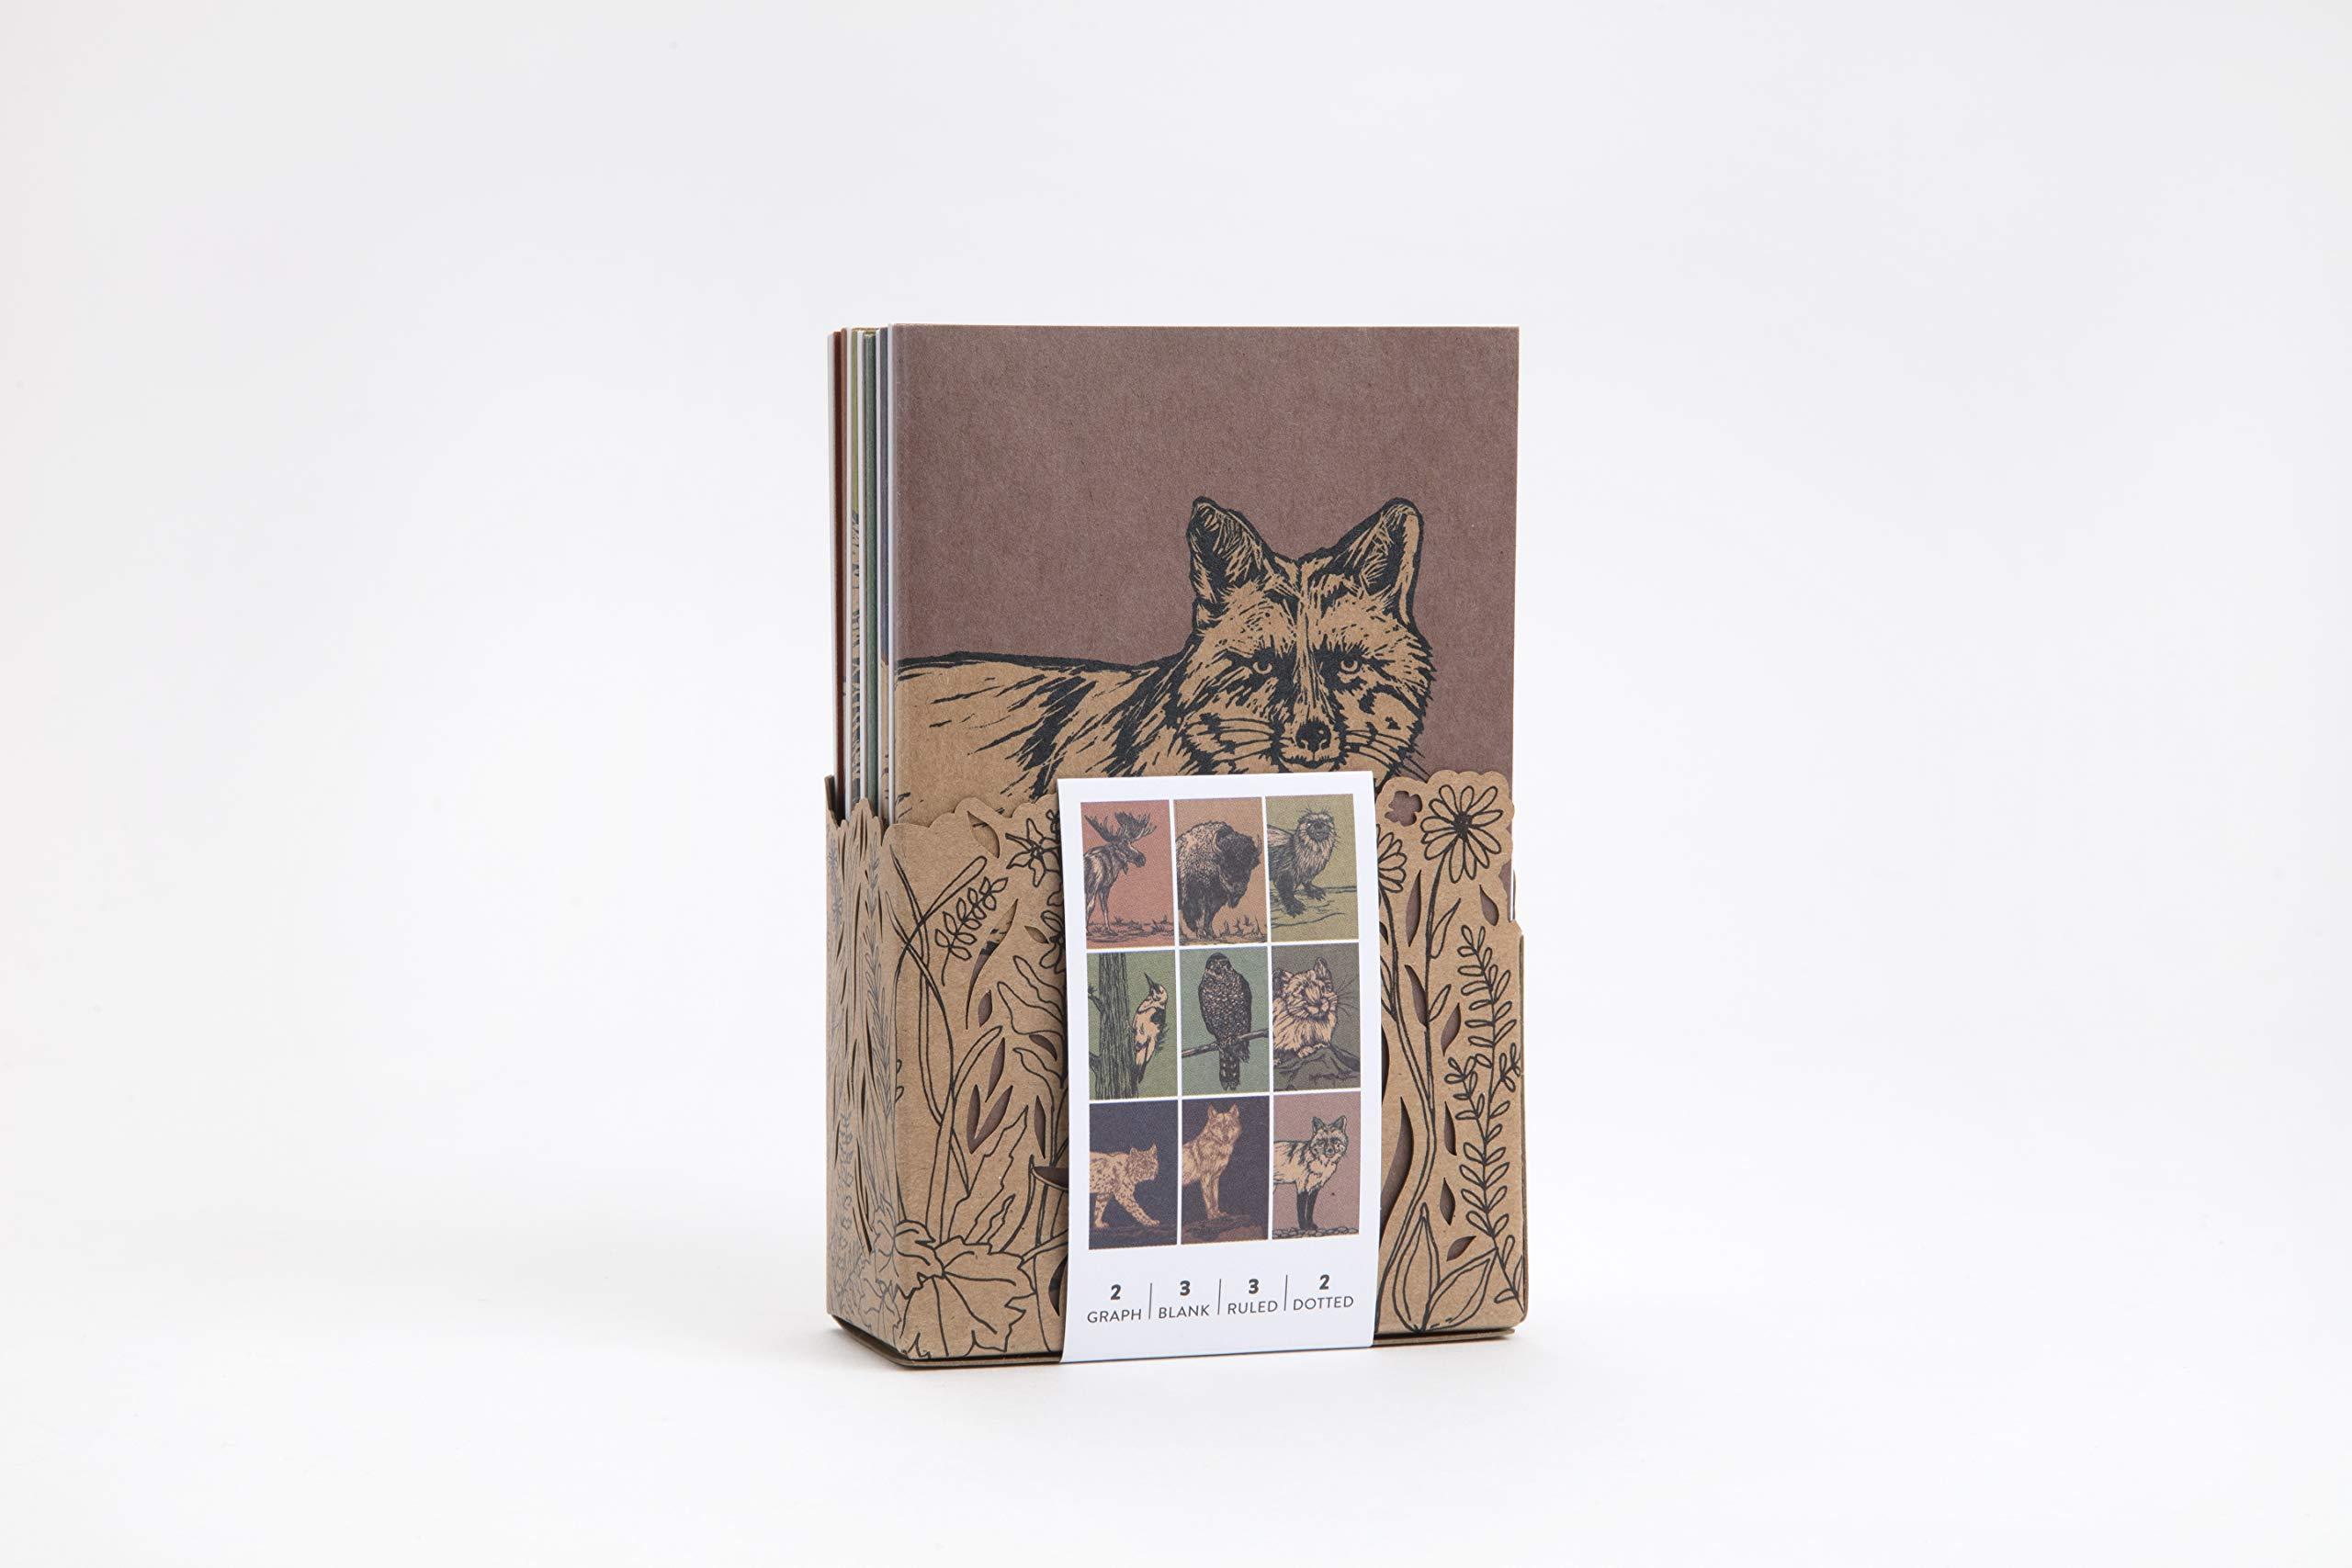 Animals Wildlife Hand Screen Printed Woods Elks Notebook Jotter Notepad To-Do List